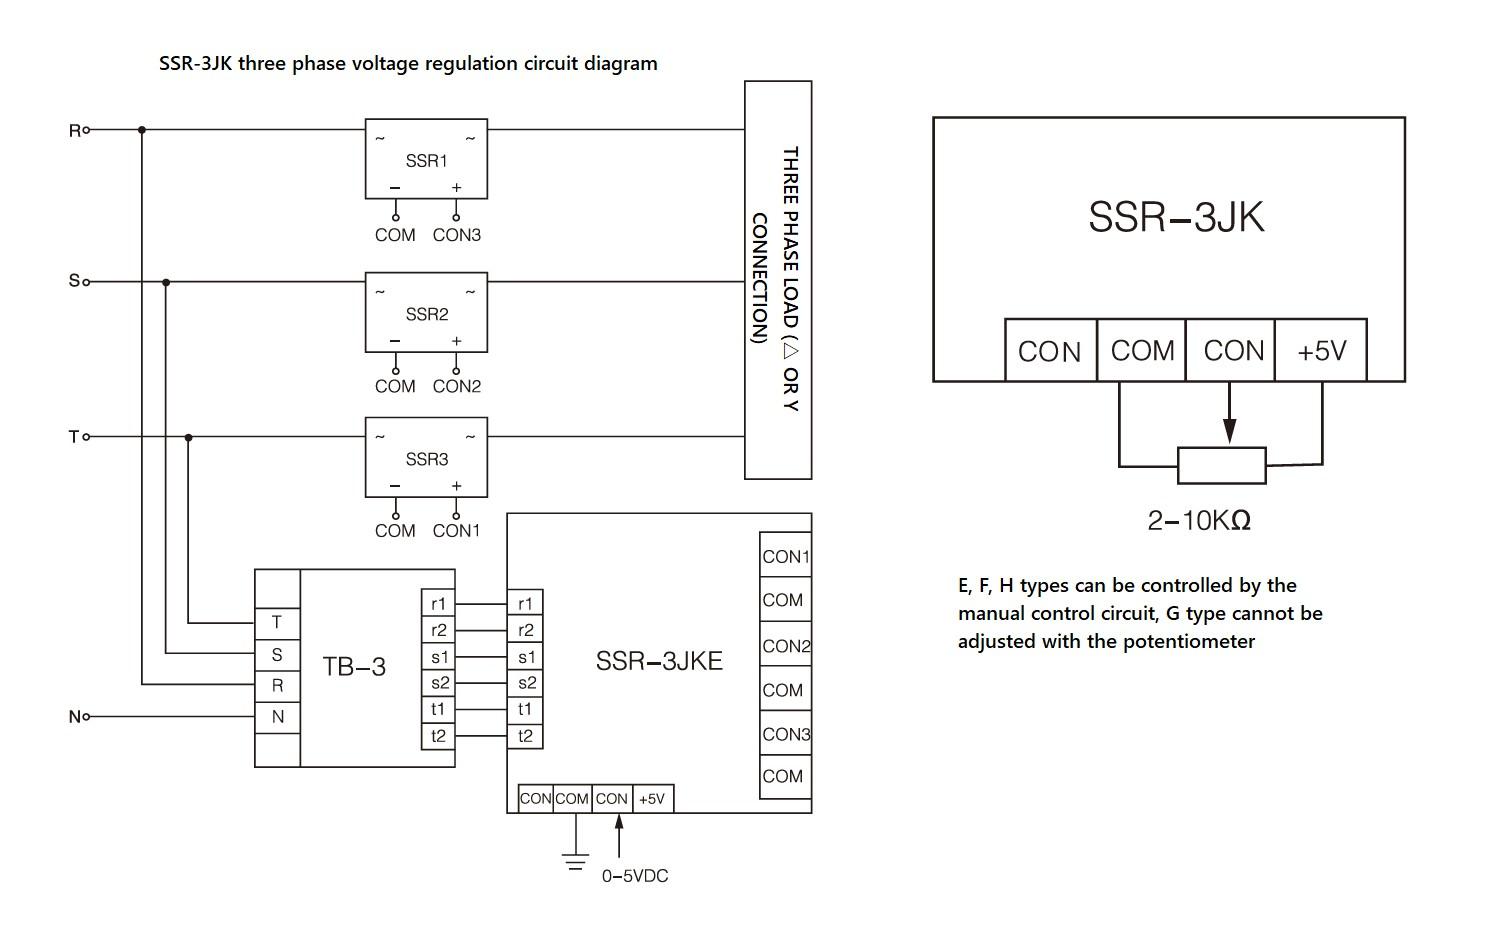 hight resolution of wiring diagram ssr 3jk series